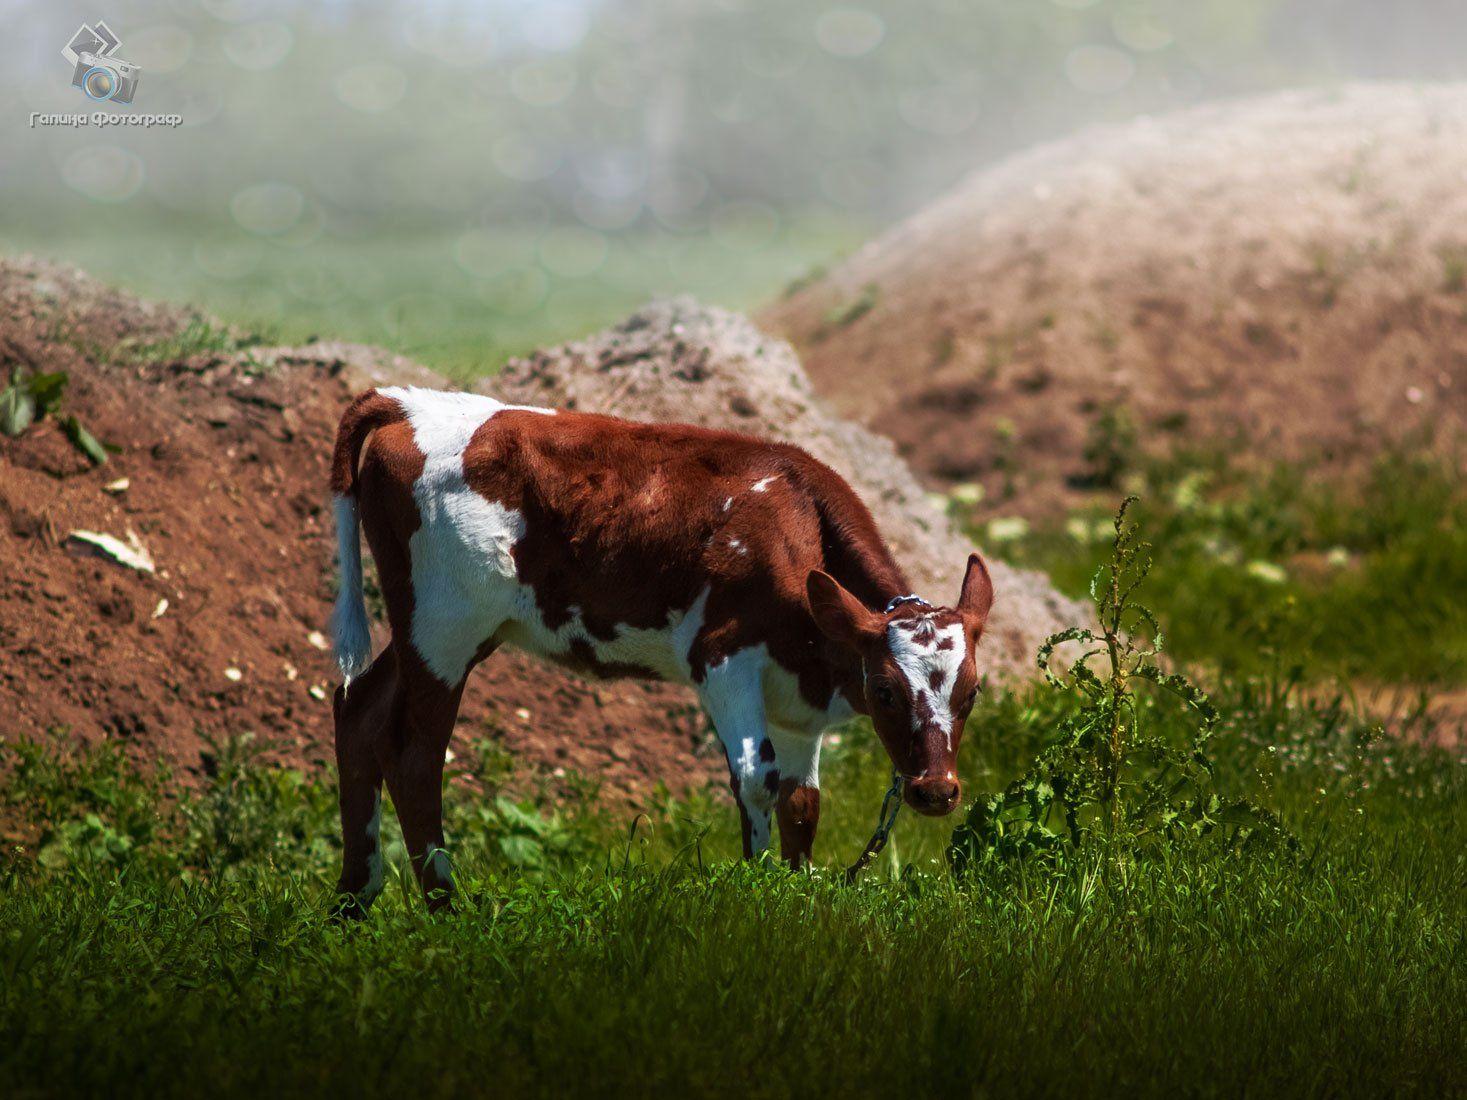 корова, тёлка, животные, пастбище, луг, ферма, рябушка, Галя